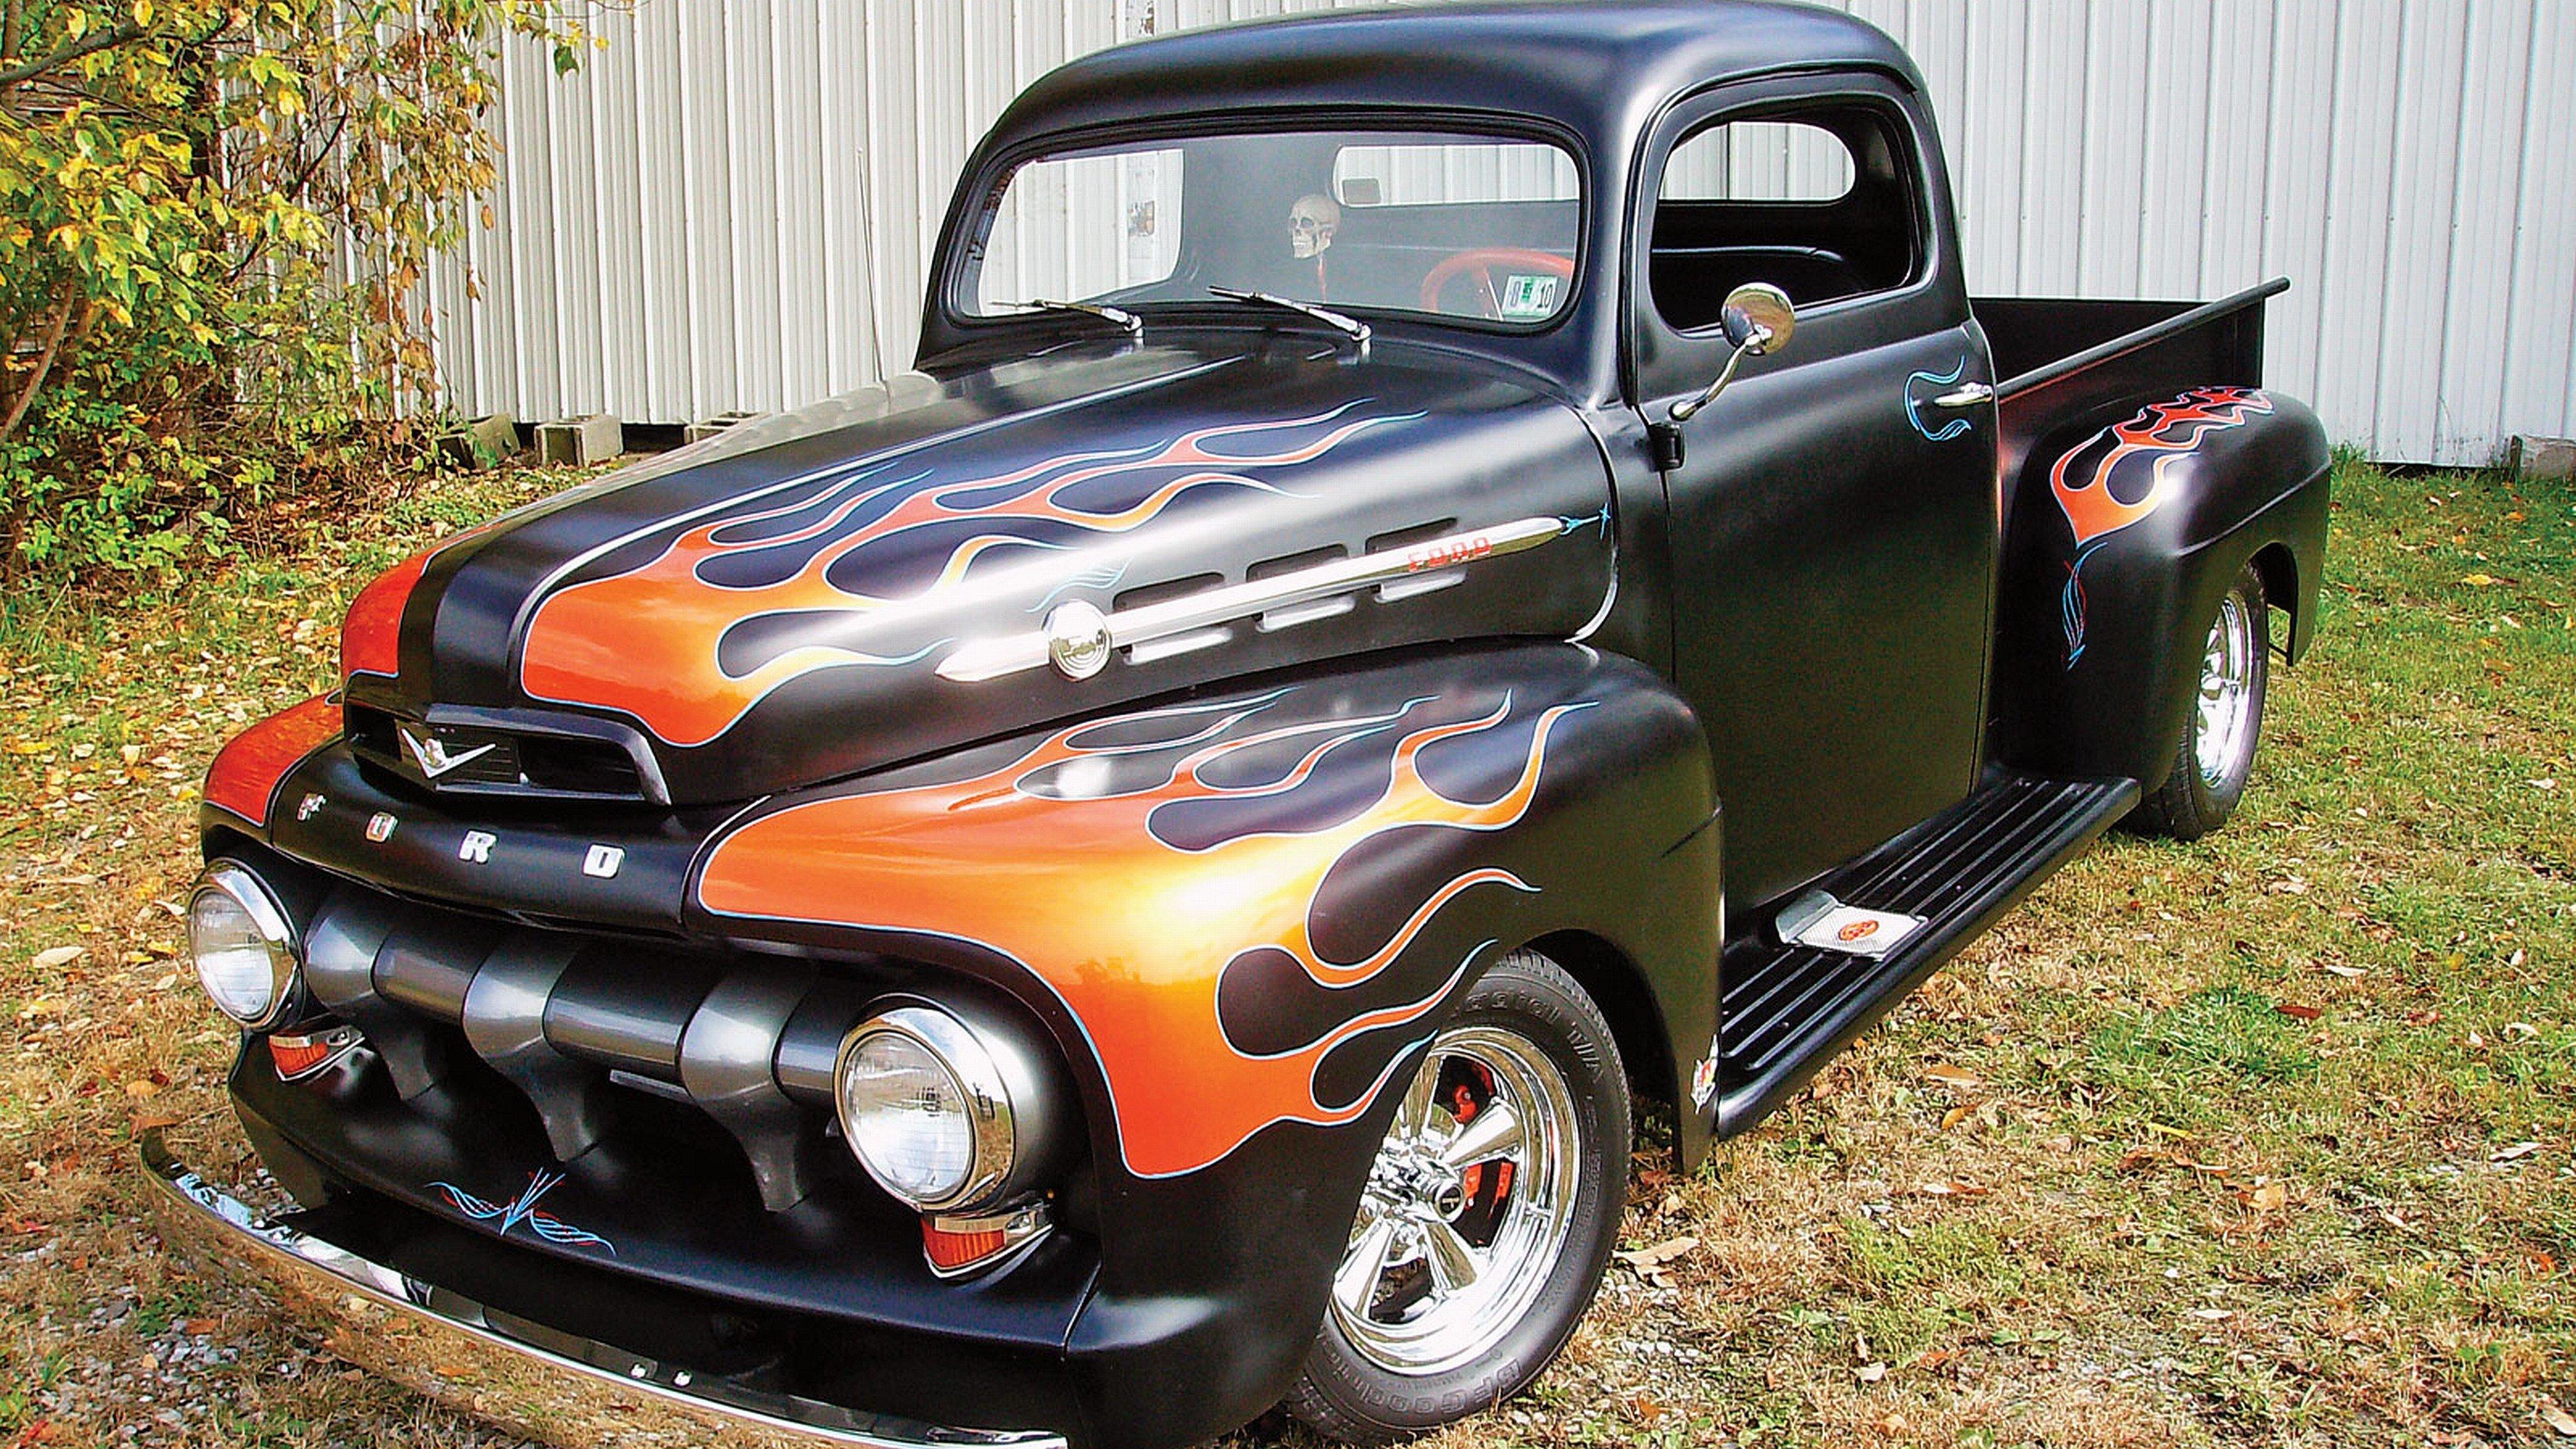 flames Hot Rod Ford trucks Classic vehicles wallpaper background 3840x2160